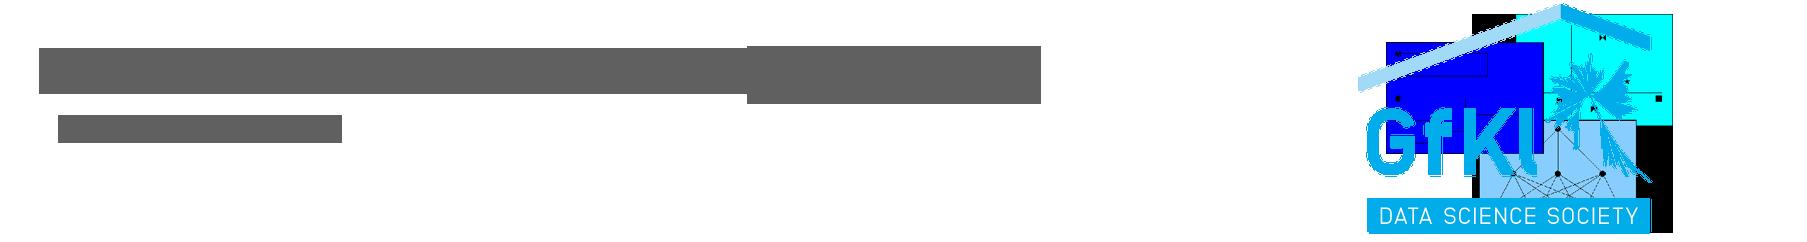 Gesellschaft für Klassifikation (GfKl)